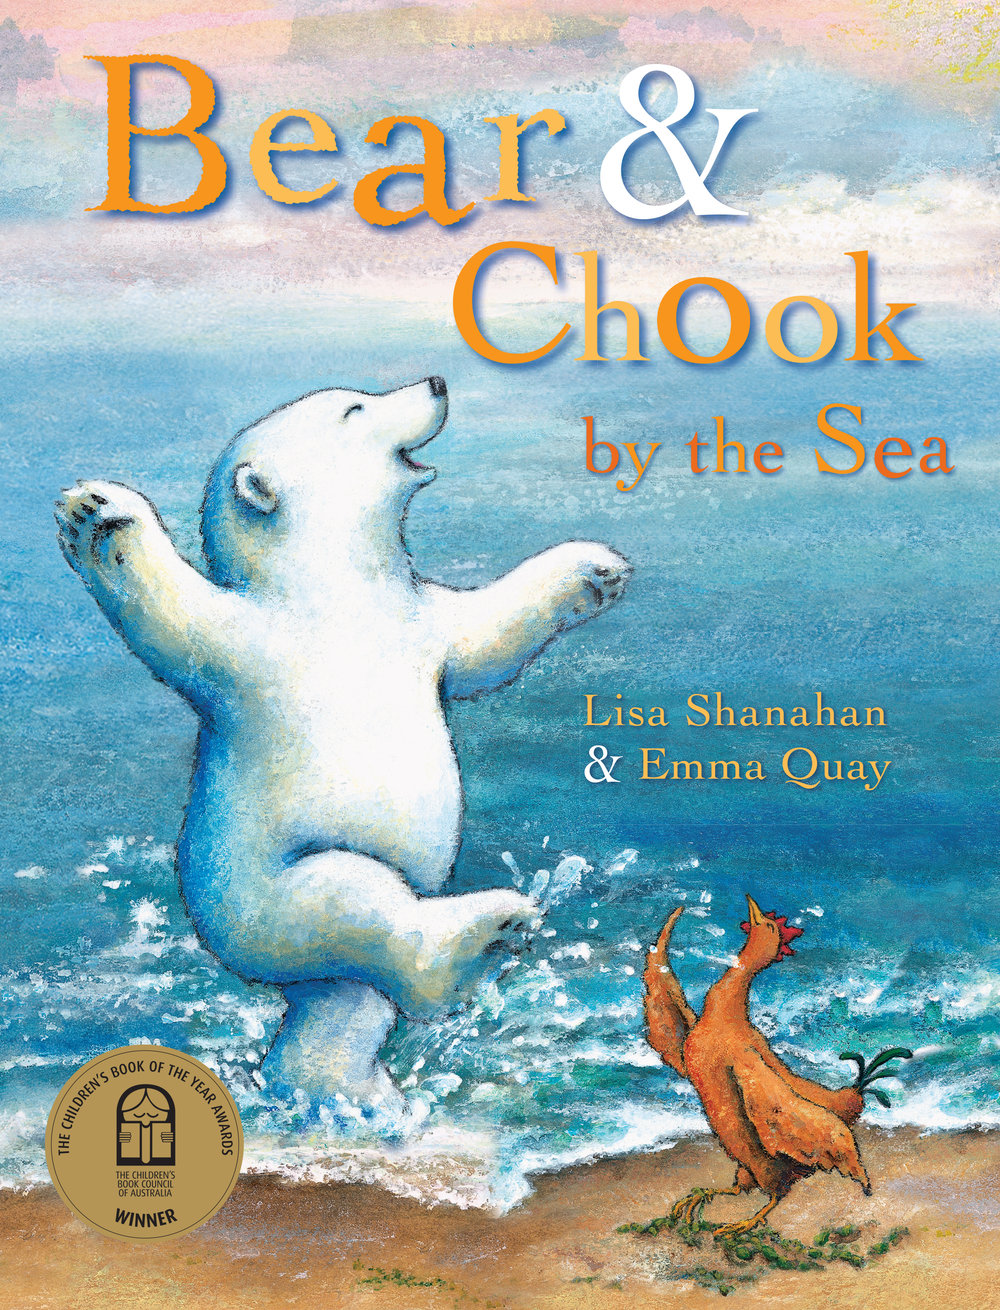 BEAR AND CHOOK BY THE SEA by Lisa Shanahan and Emma Quay (Lothian Books)  http://www.emmaquay.com